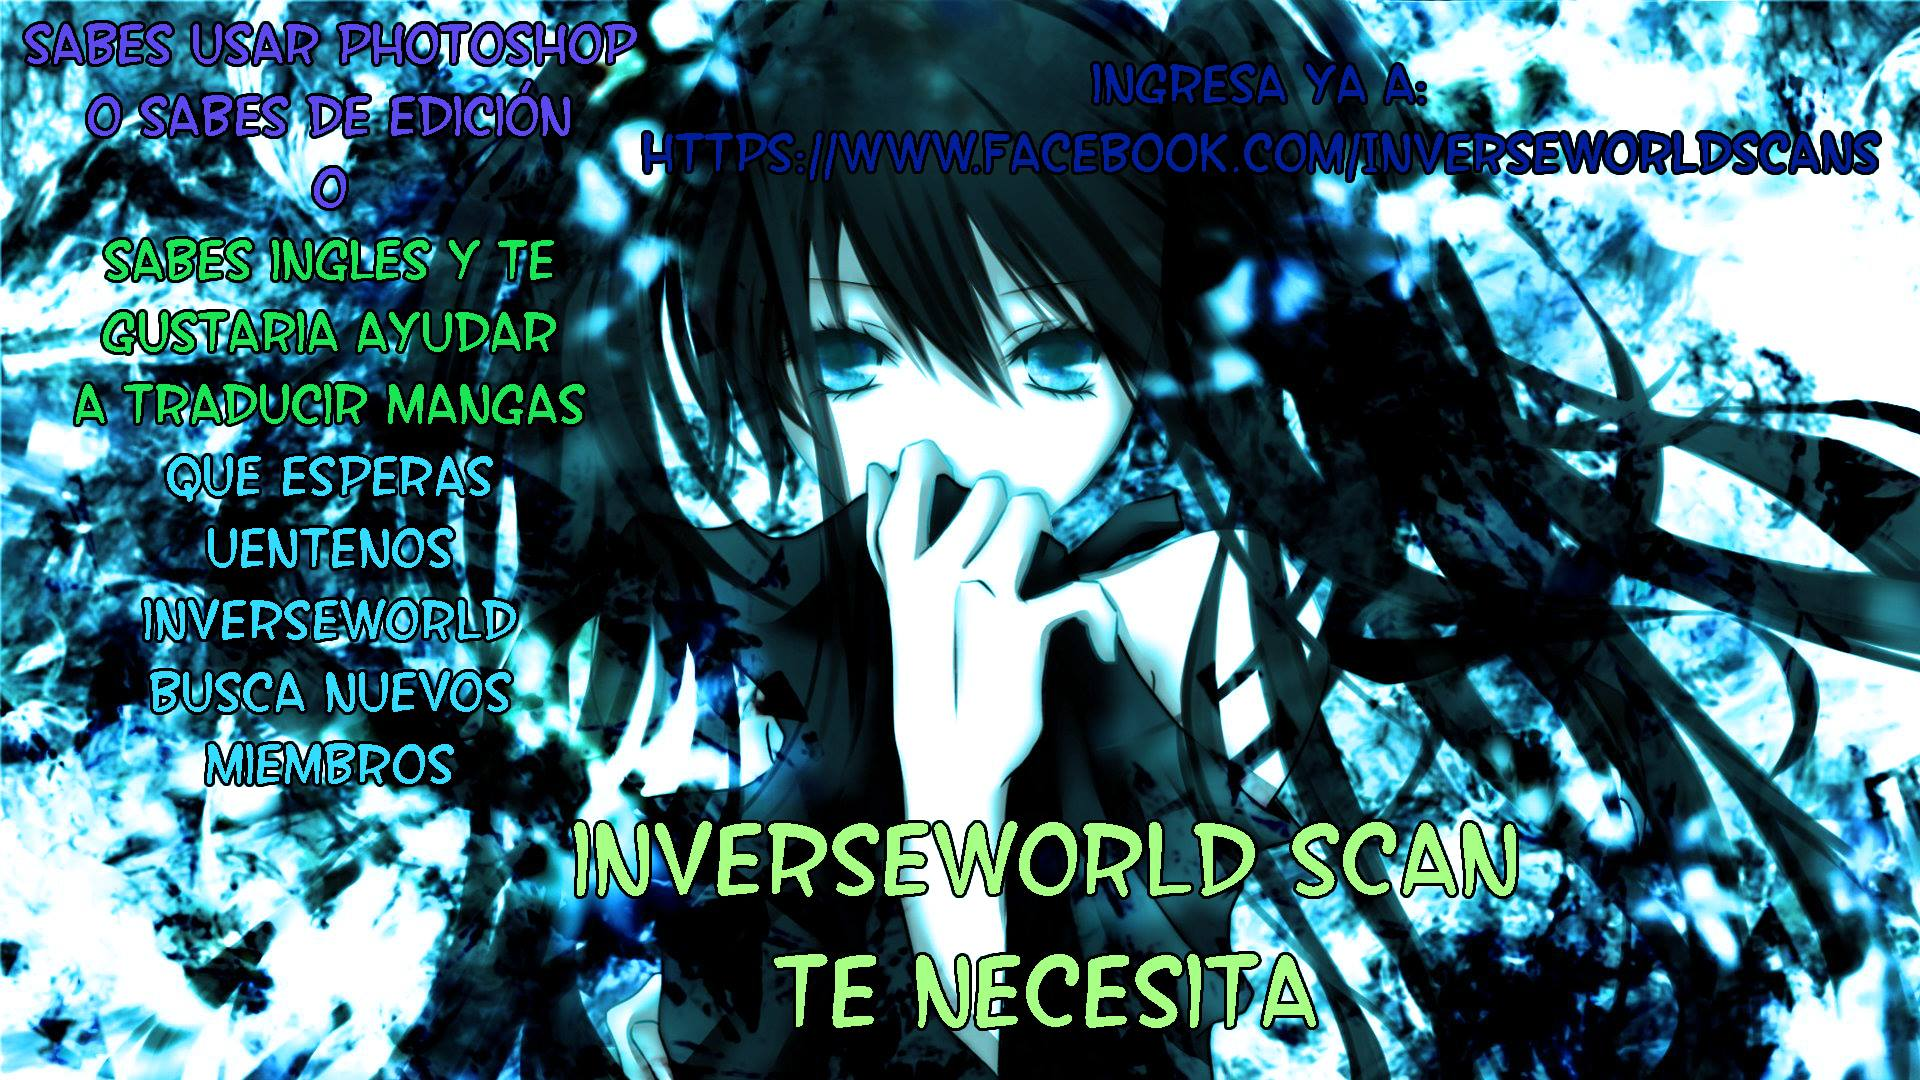 http://c5.ninemanga.com/es_manga/18/16210/415333/81853dc778186bff64ba4b47dacfe8aa.jpg Page 2